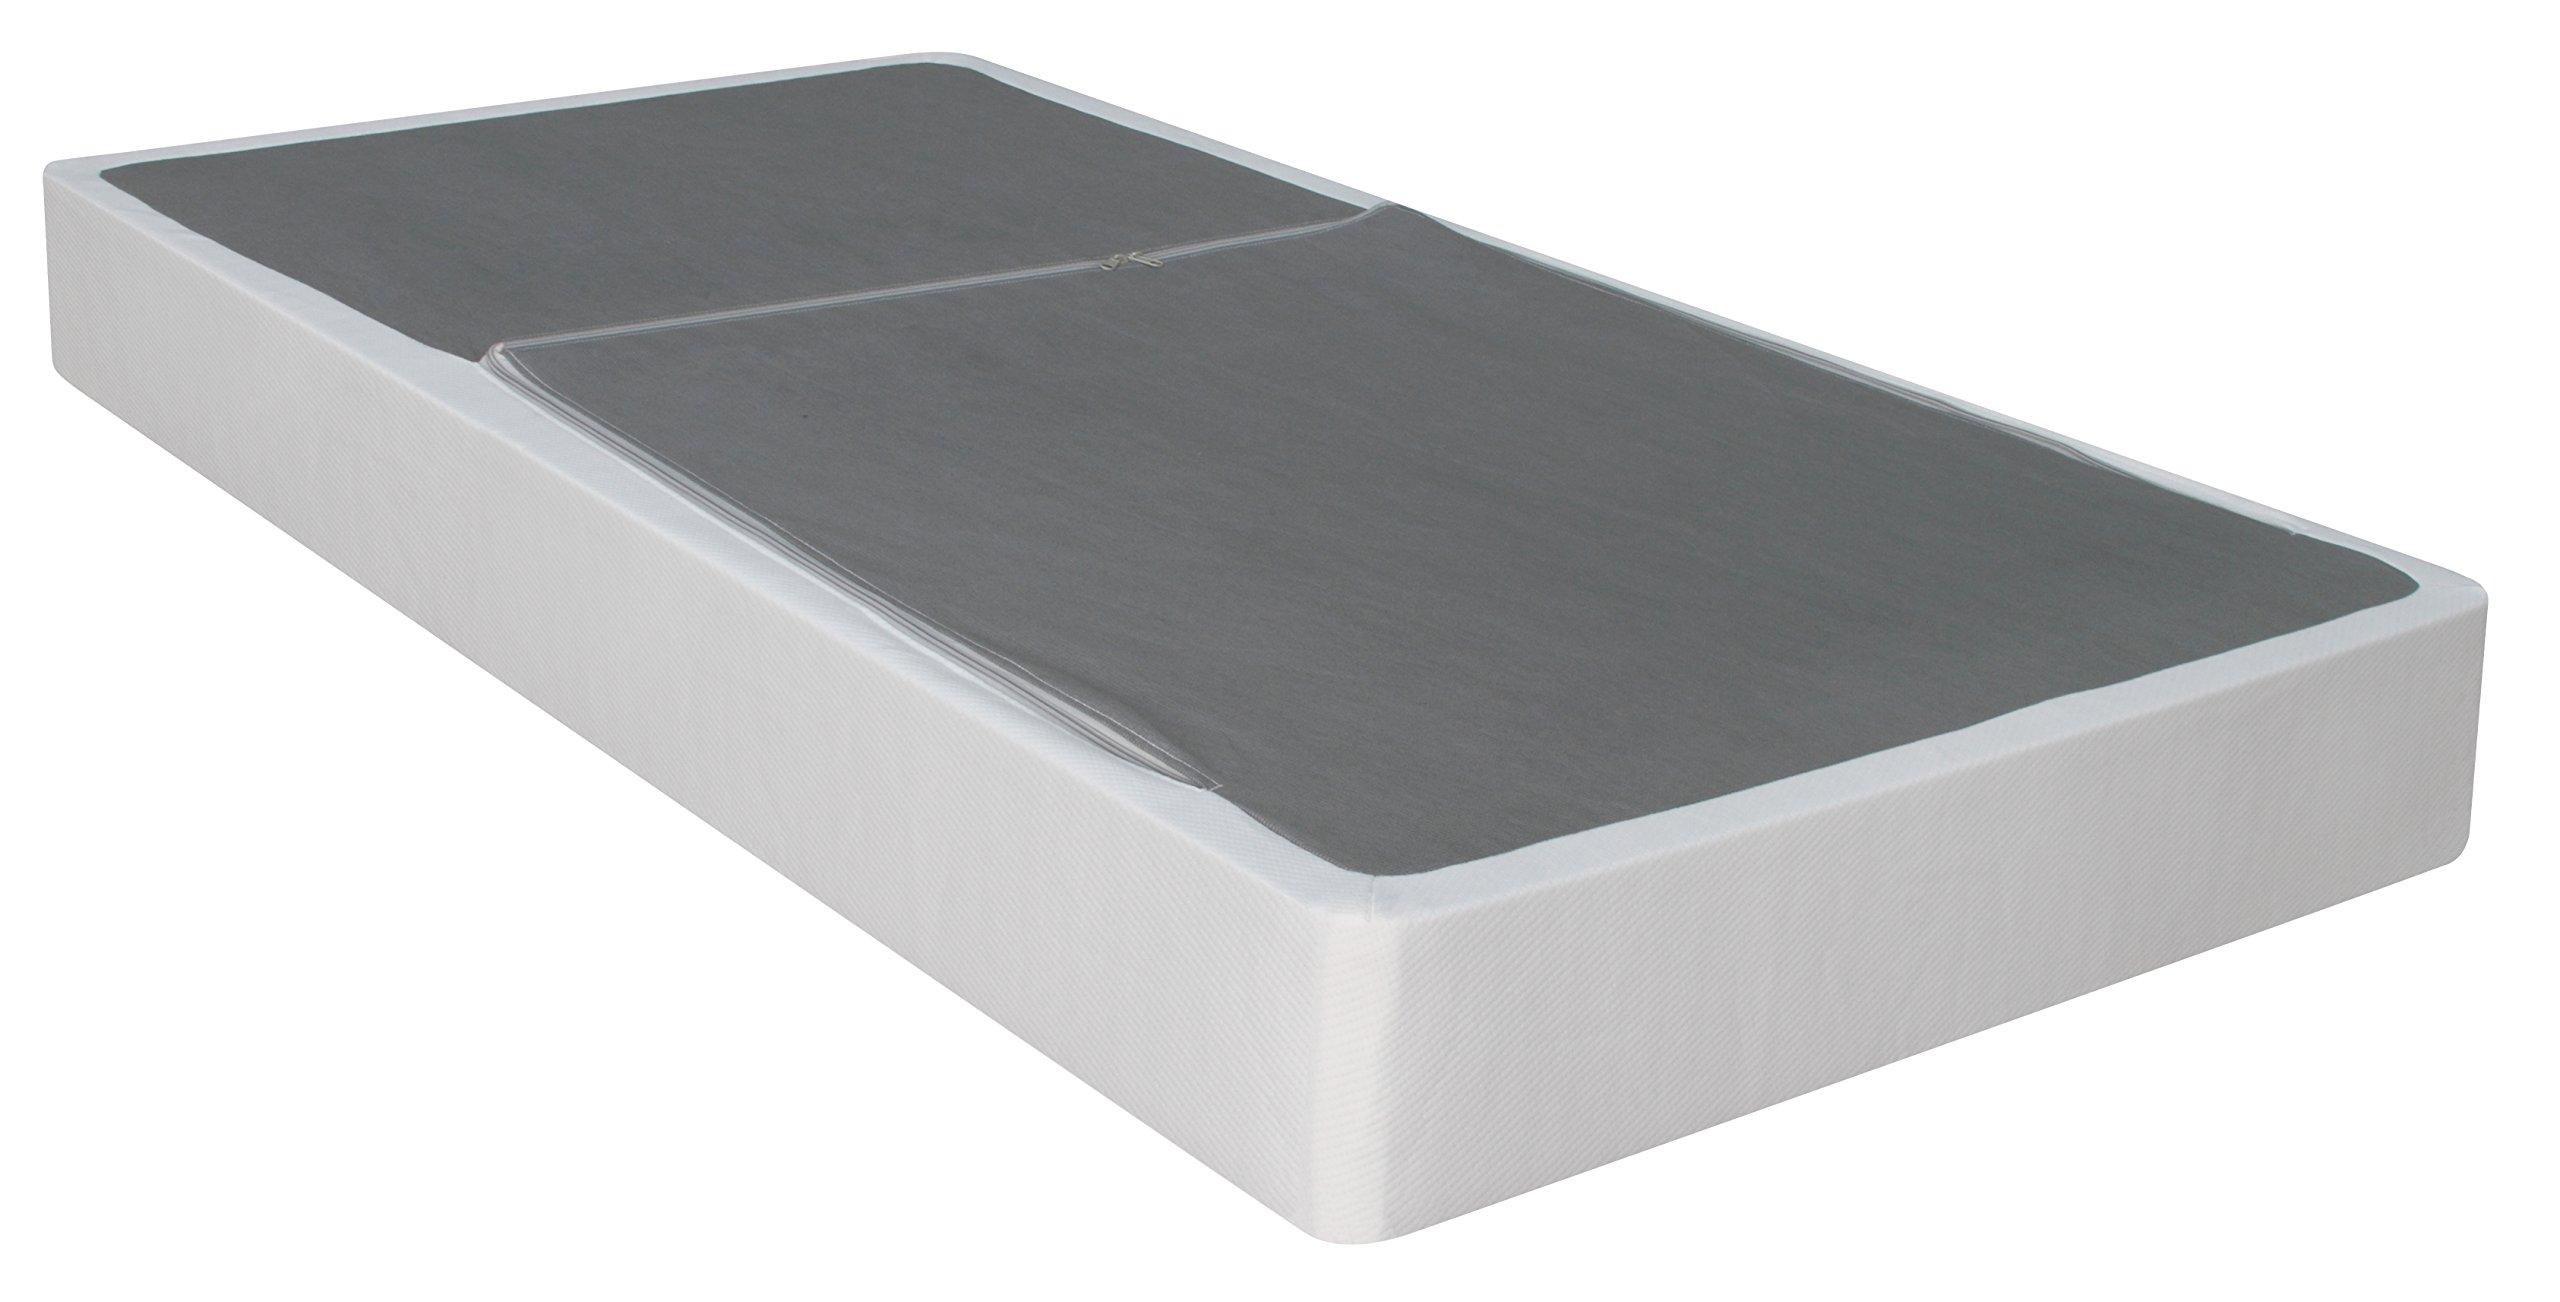 Best Price 7.5'' New Steel Box Spring/Mattress Foundation, Twin